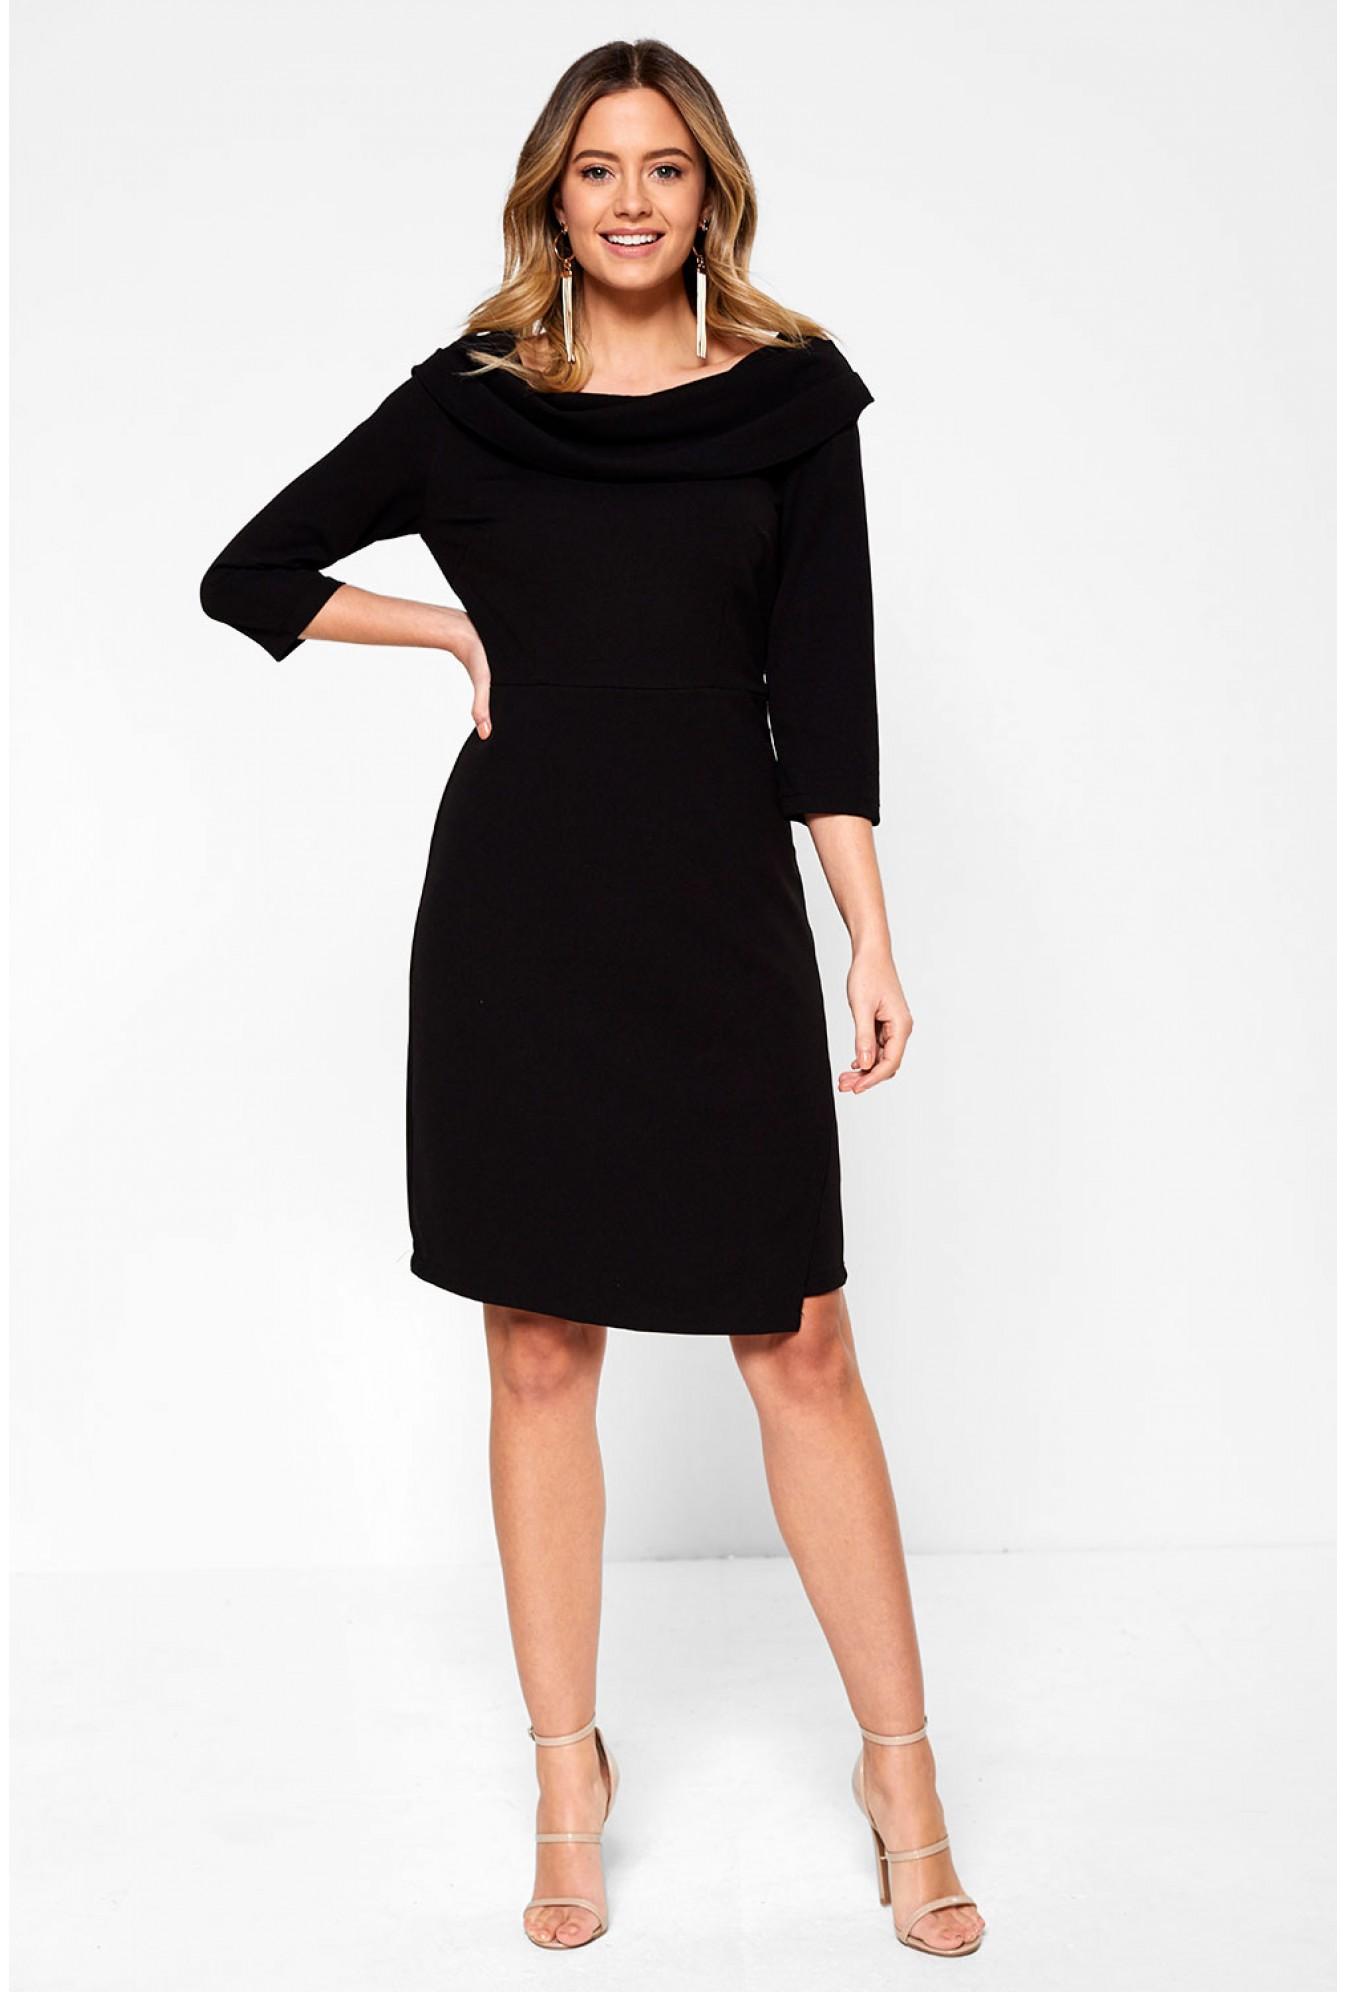 bd0de3b3b0f1 Marc Angelo Judy Tailored Midi Dress with Cowl Neckline in Black ...